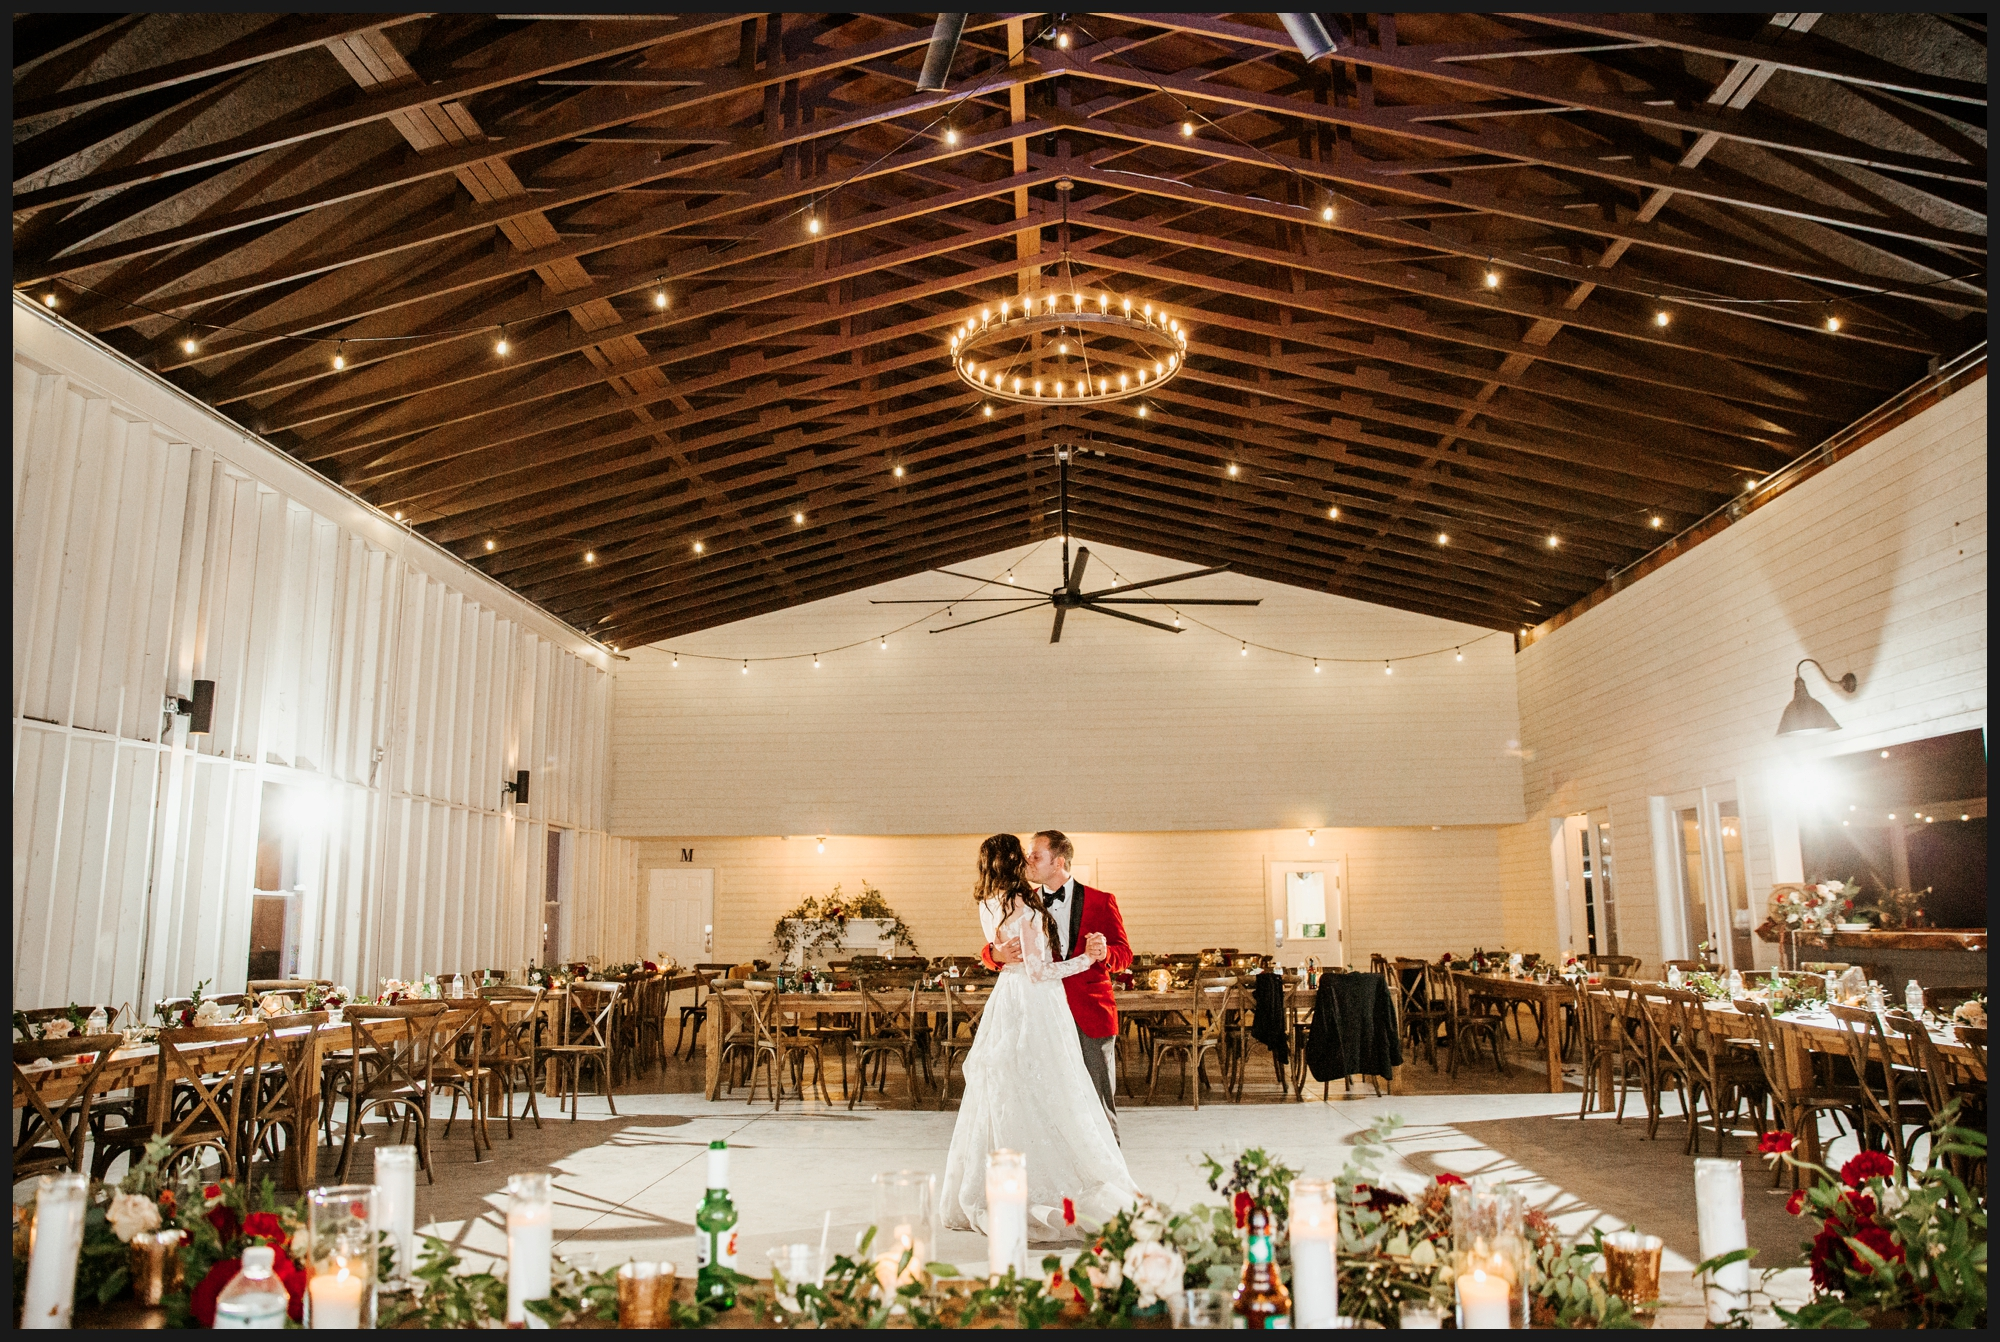 Orlando-Wedding-Photographer-destination-wedding-photographer-florida-wedding-photographer-hawaii-wedding-photographer_0550.jpg